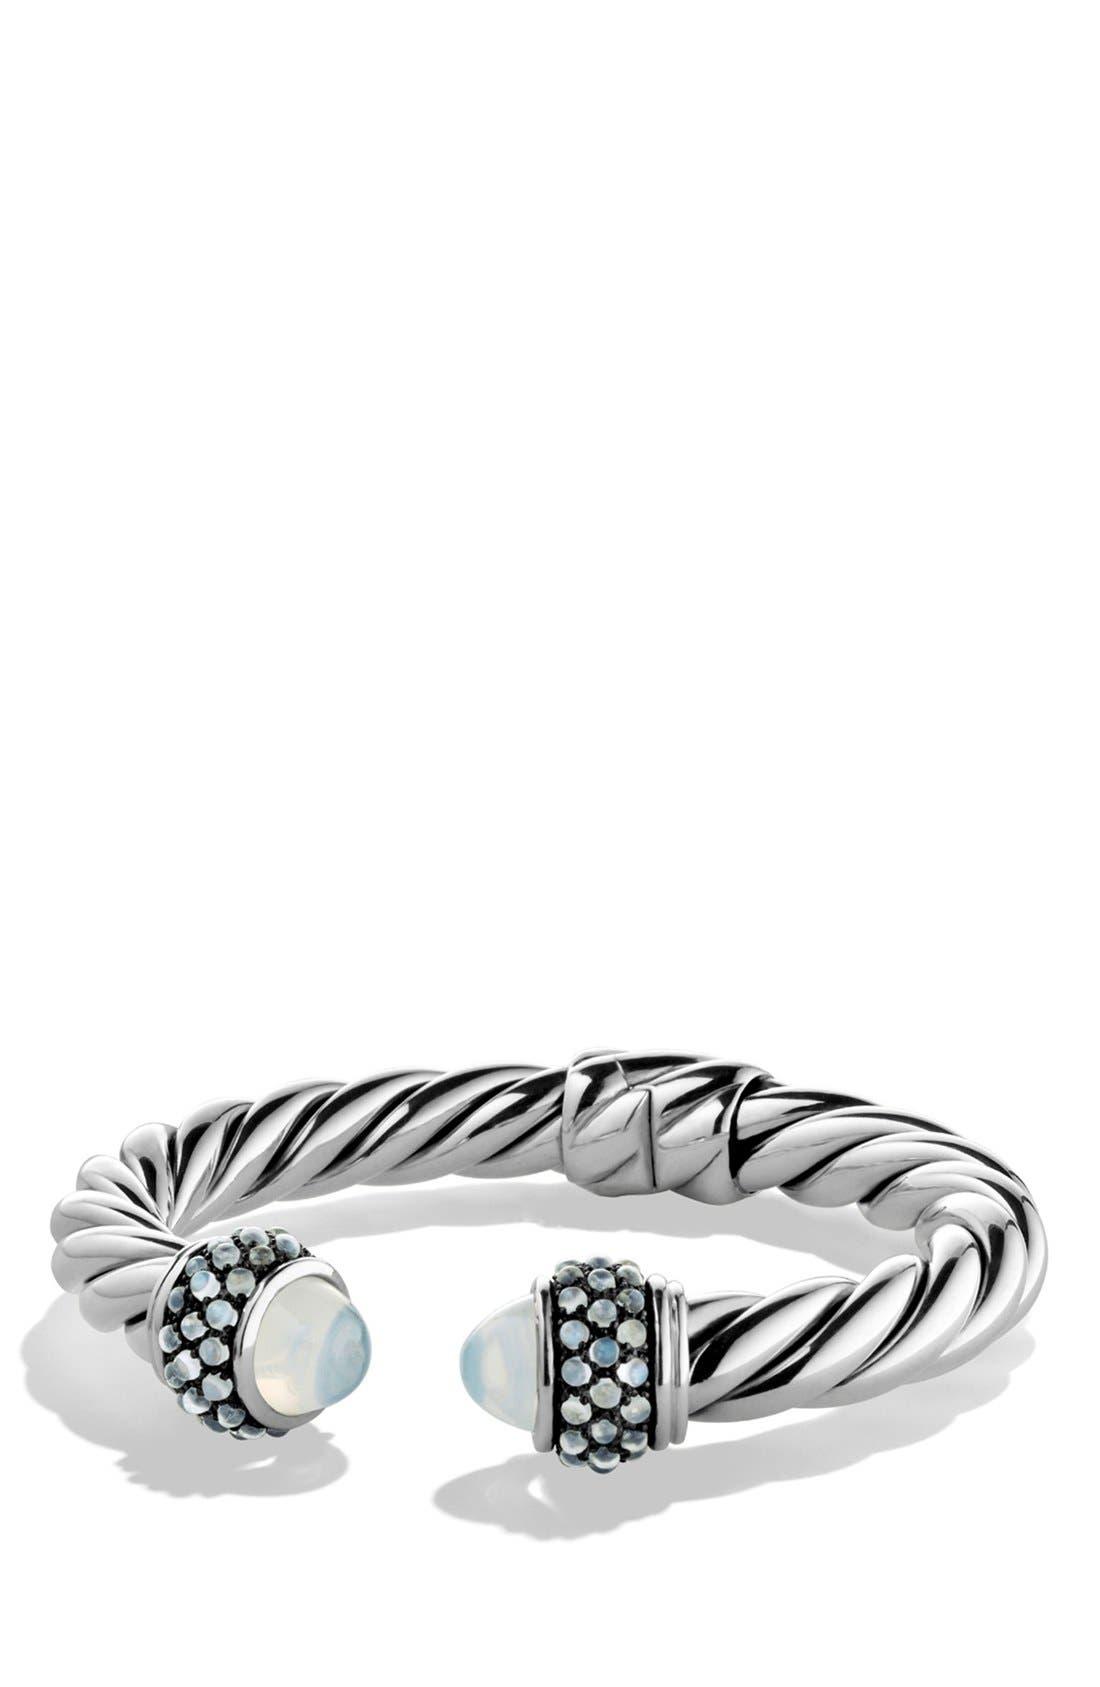 Bracelet with Semiprecious Stones, 10mm,                             Main thumbnail 1, color,                             MOON/ MILKY QUARTZ